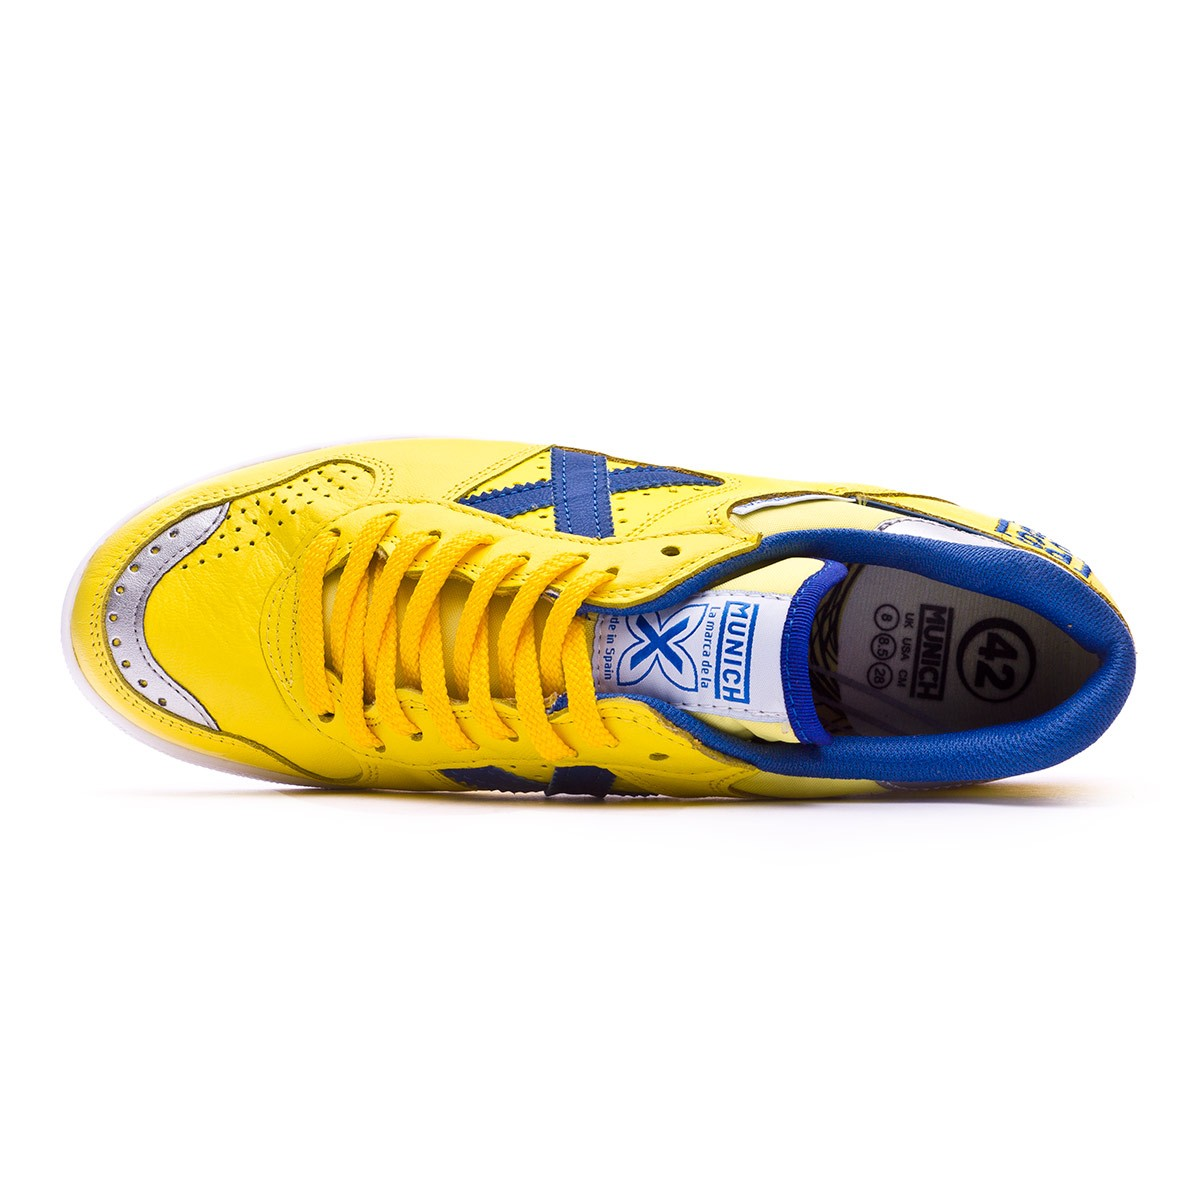 9bfb16ff647 Futsal Boot Munich Continental Paco Sedano Yellow-Blue - Football store  Fútbol Emotion